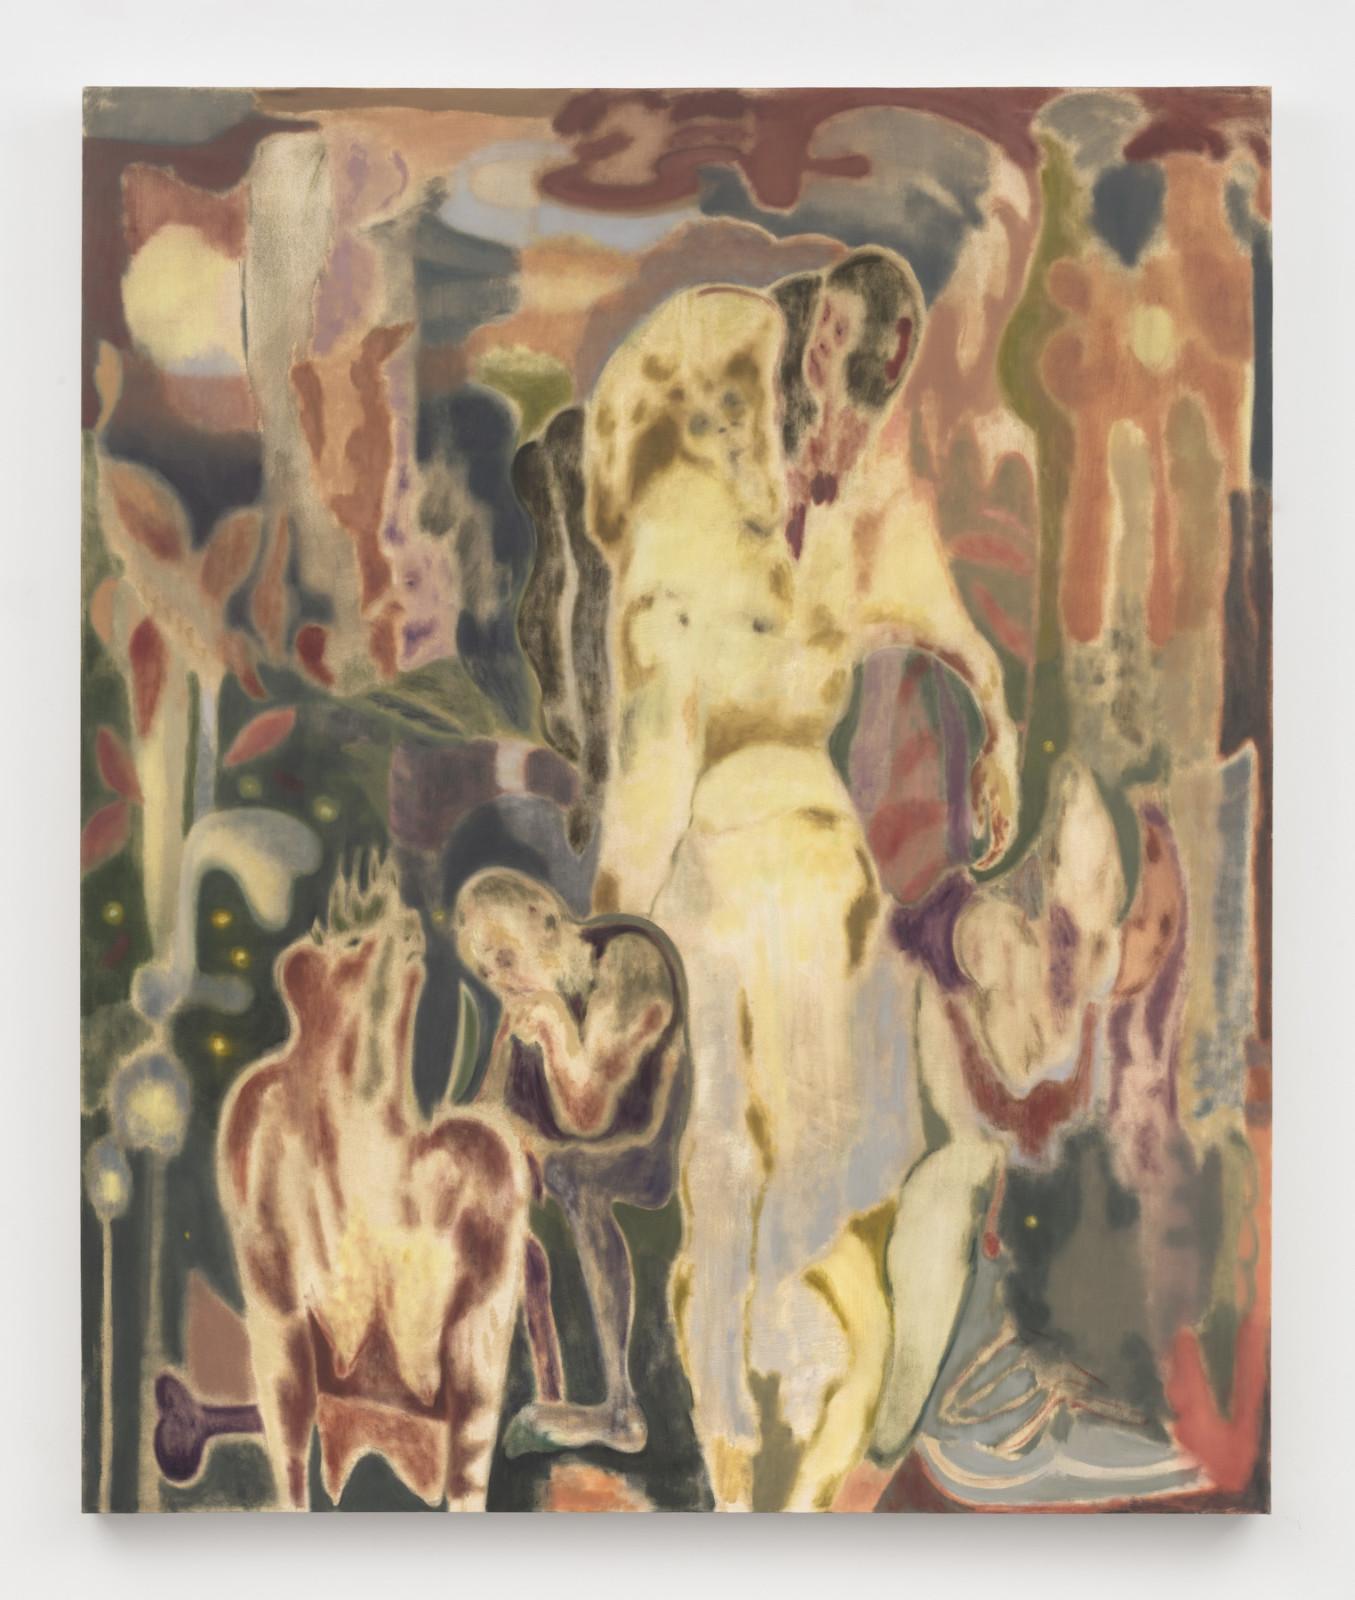 "<div class=""artist""><strong>Maja Ruznic</strong></div> <div class=""title""><em>The Help</em>, 2018</div> <div class=""medium"">Oil on canvas</div> <div class=""dimensions"">182.9 x 152.4 cm<br /> 72 x 60 in</div>"